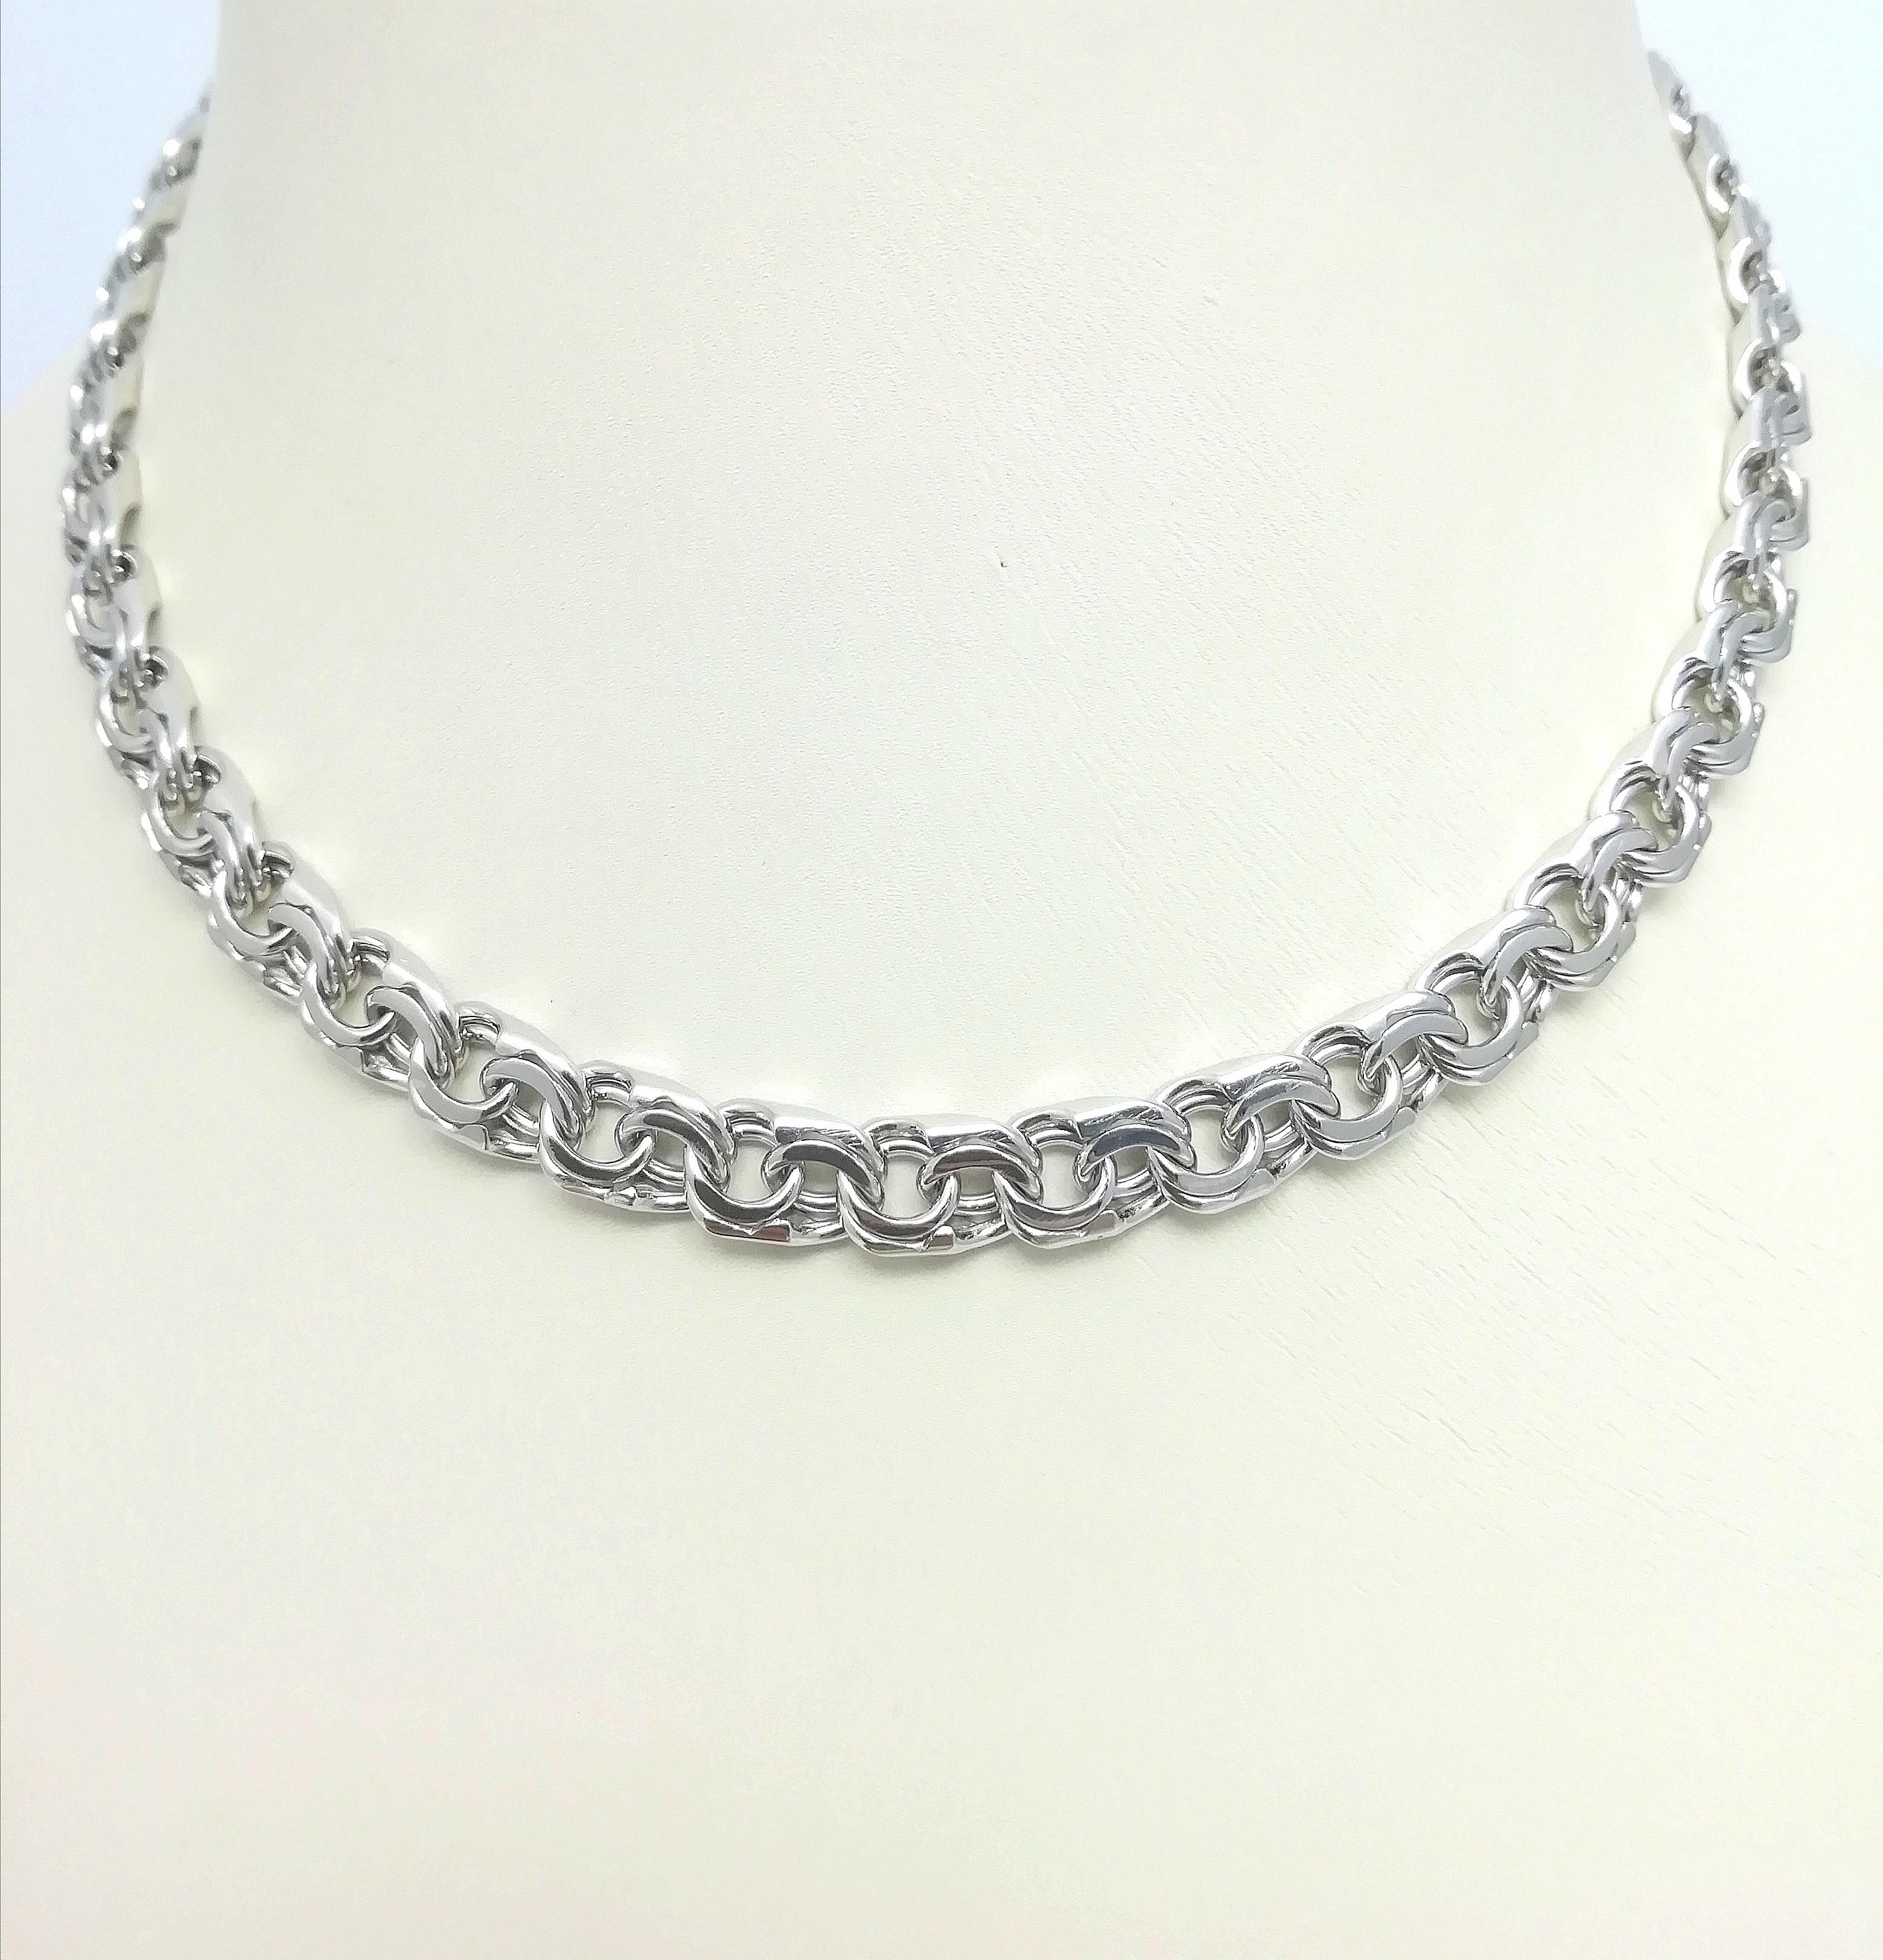 Серебро цепь дк240920-160 43,90гр